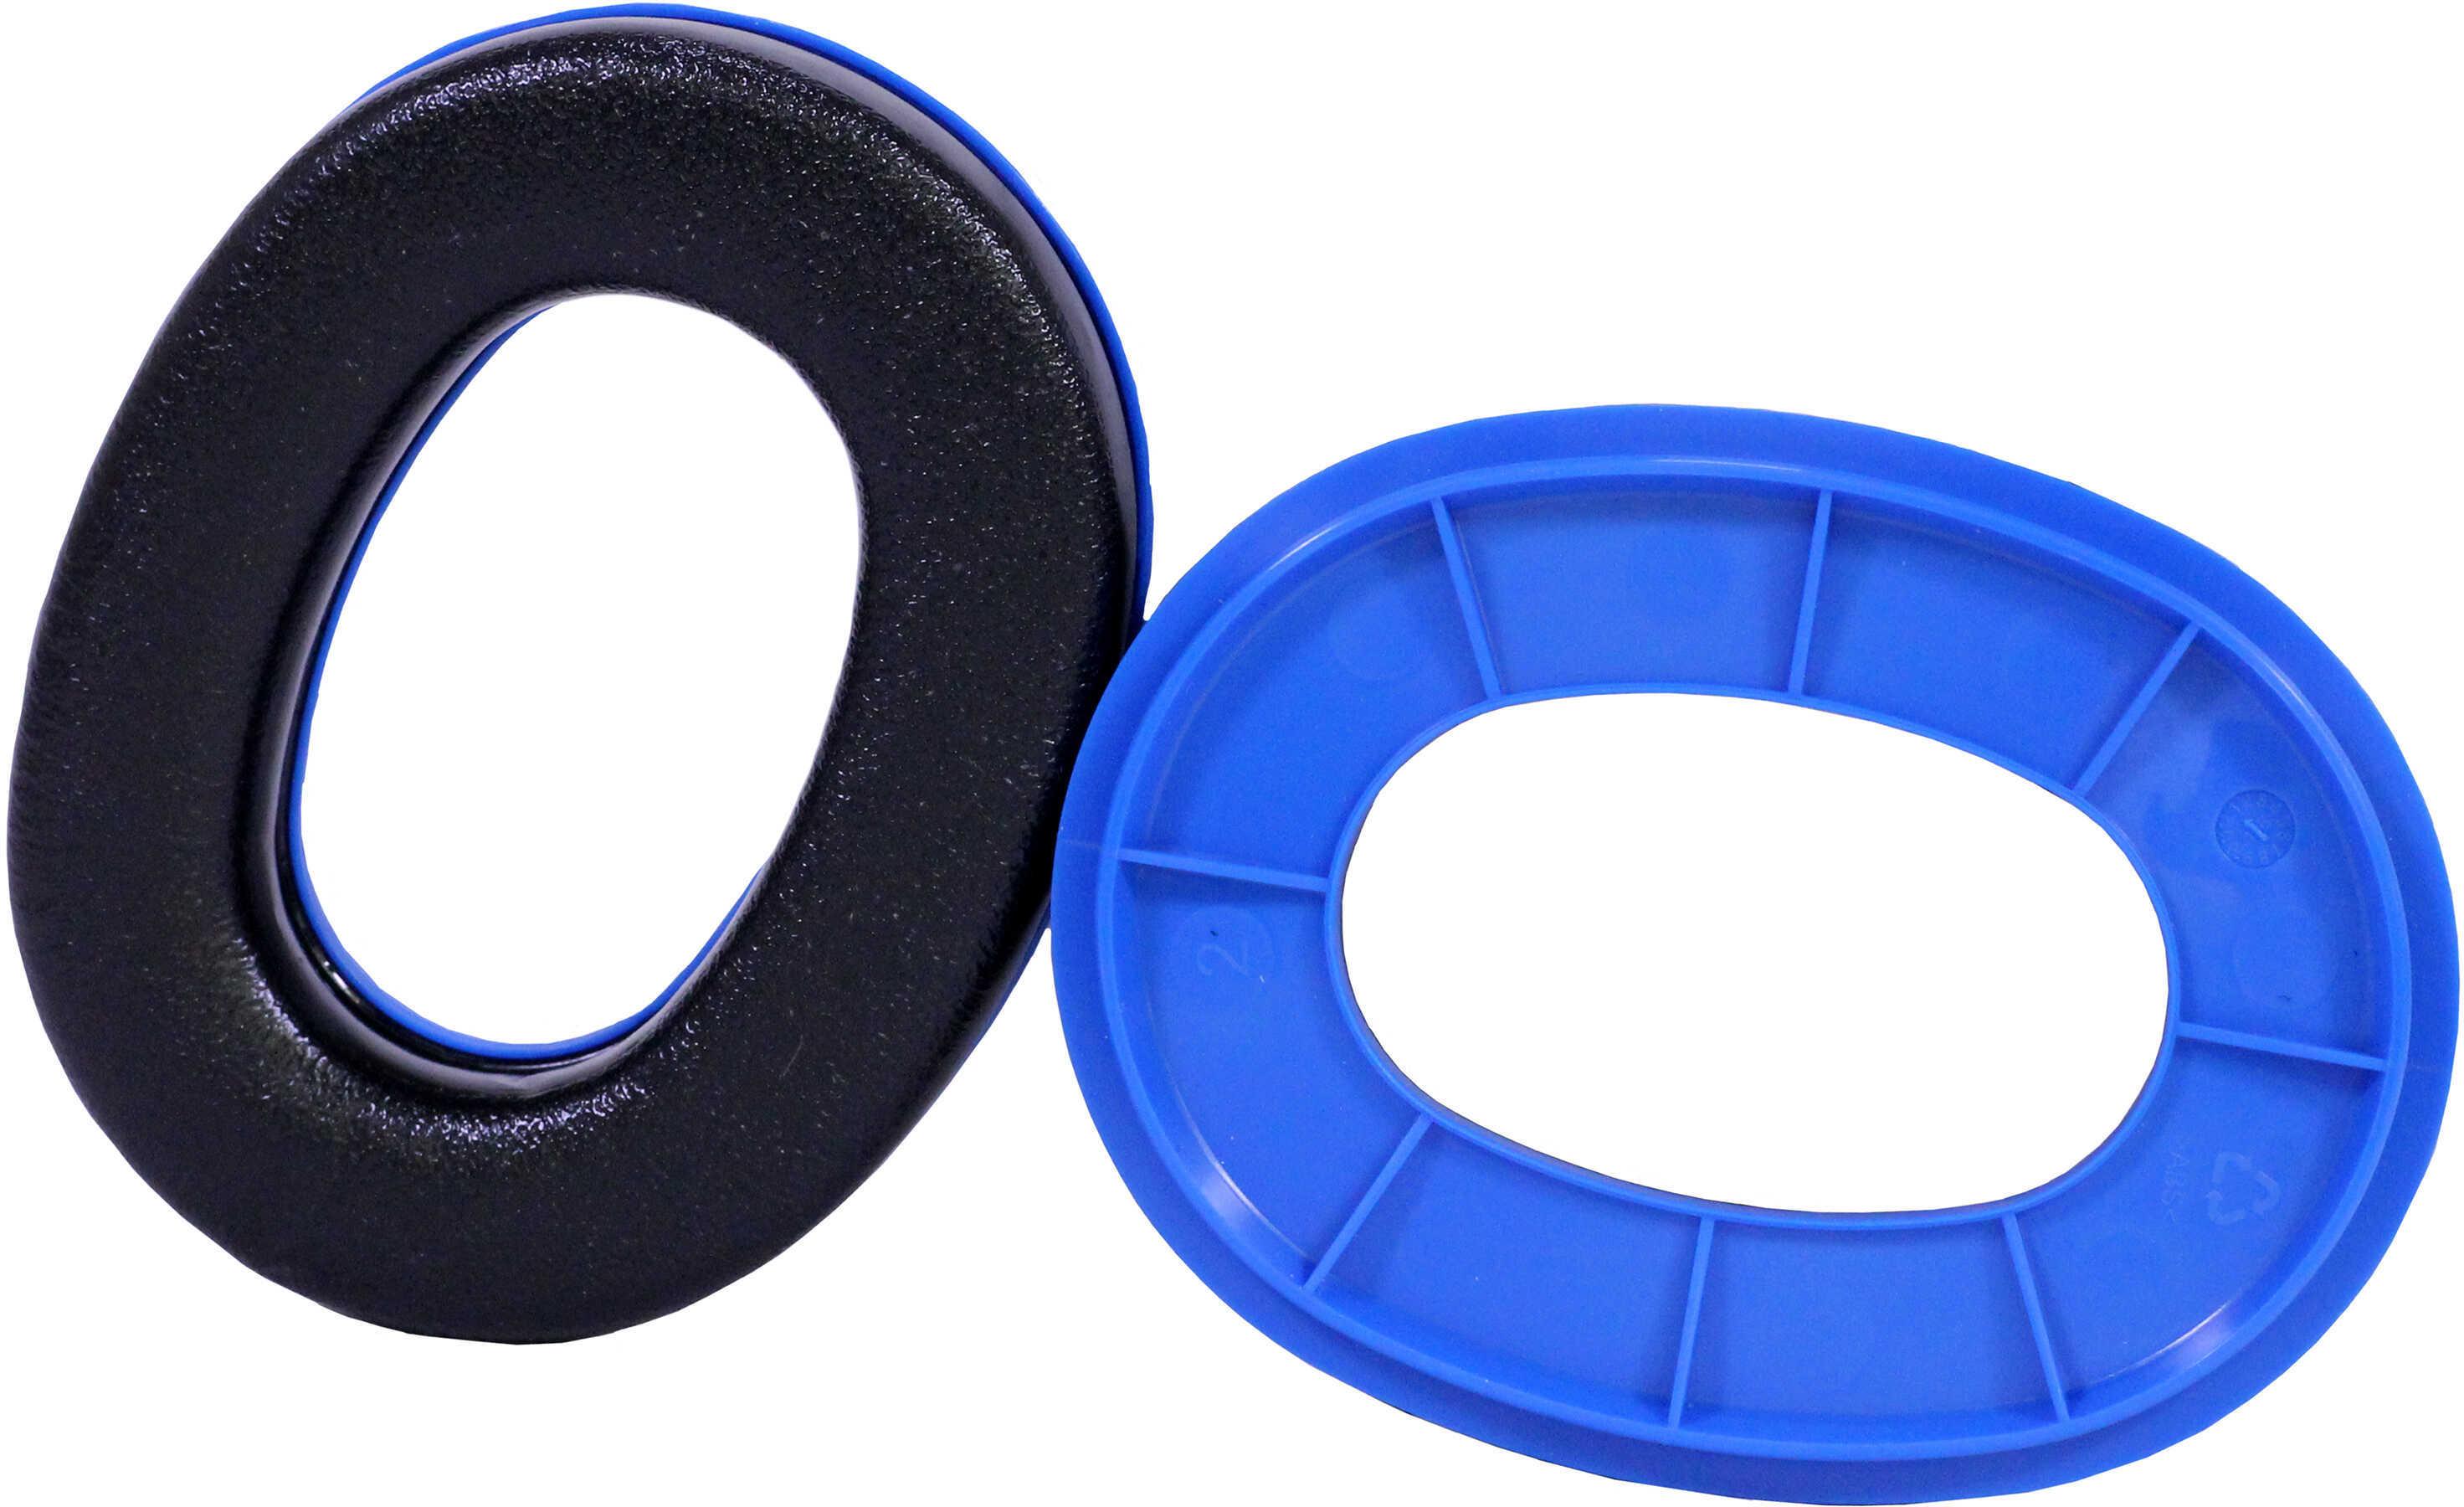 Peltor Sport Ear Cushion Custom Ring Set Blue, 2 Pack Md: EC-PEL-BLU-6C